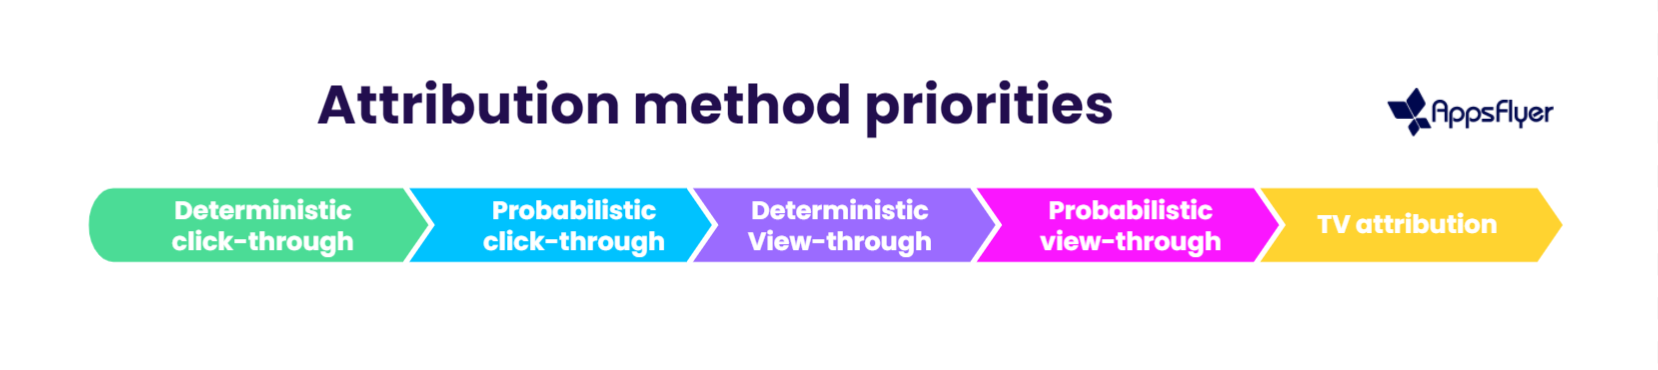 Attribution_method_priorities.png